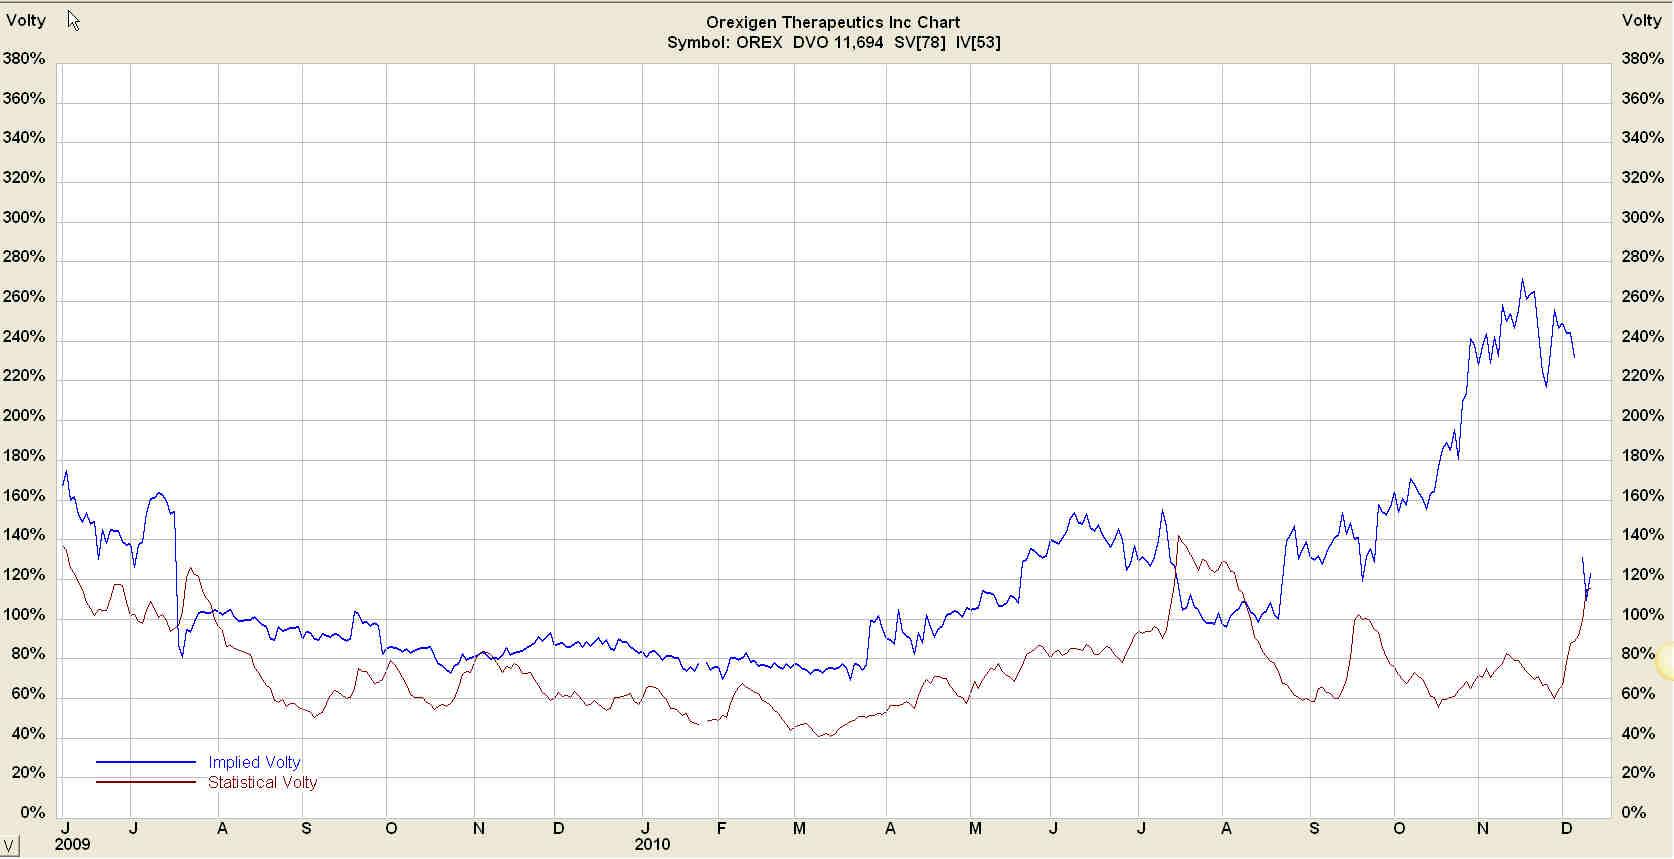 OREX Volatility Chart